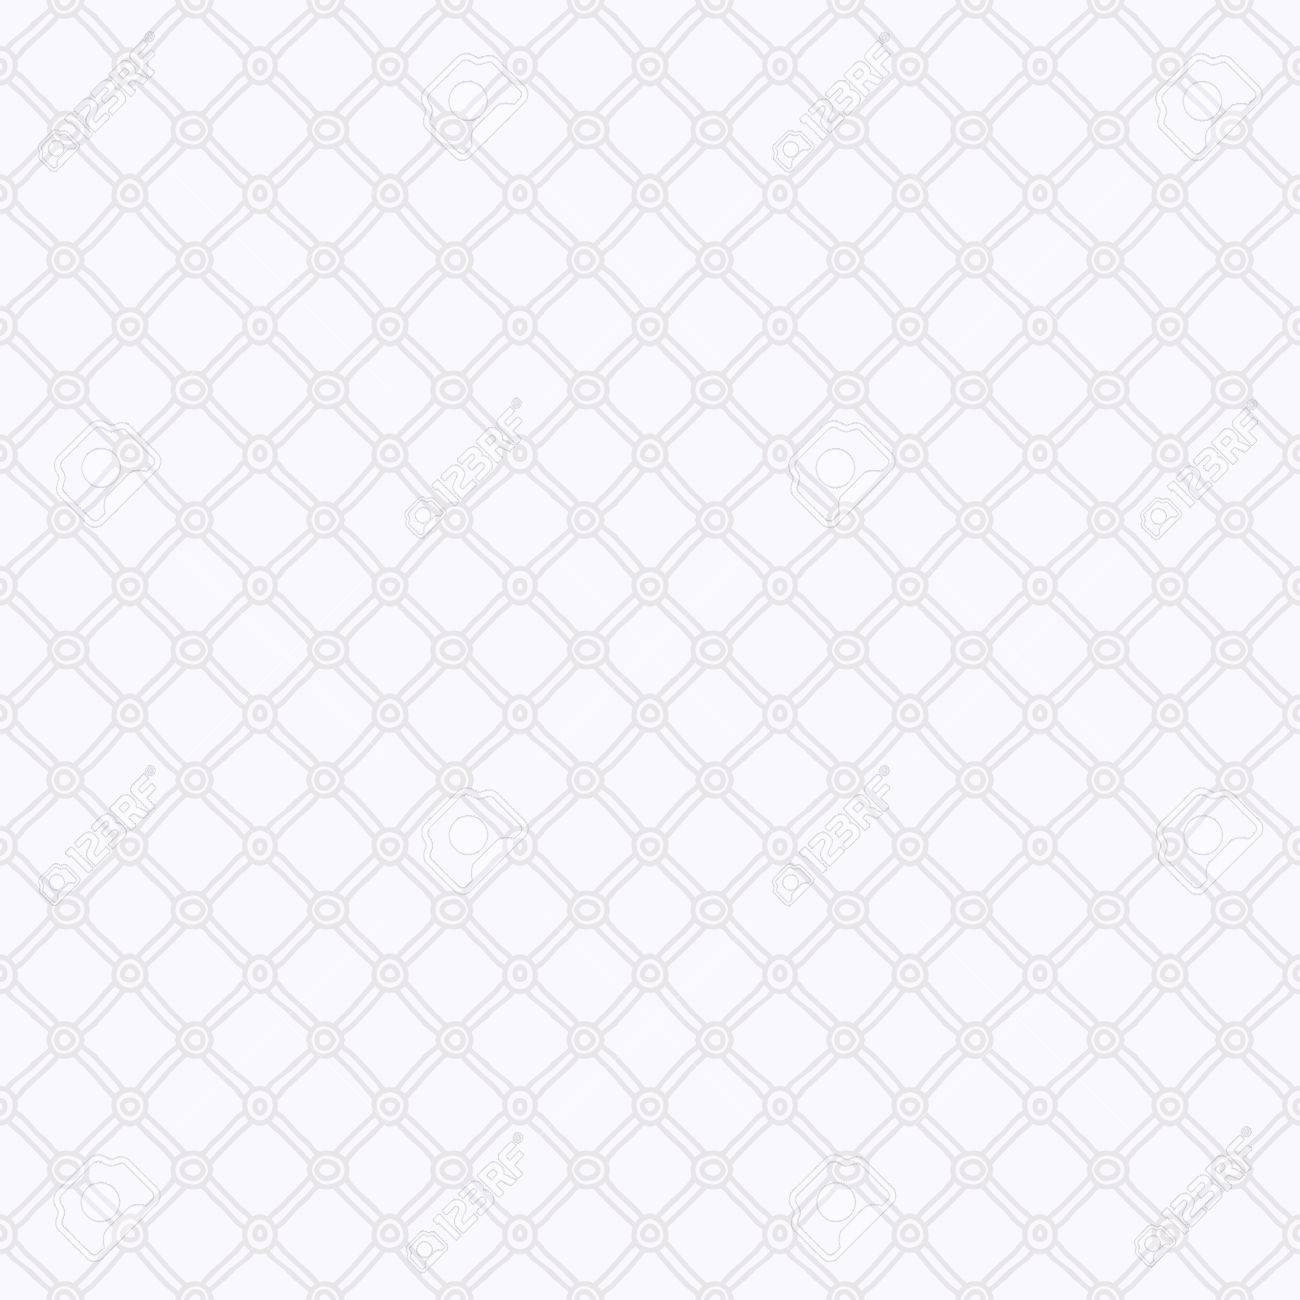 hand drawn linear simple and elegant tartan scottish ethnic pattern